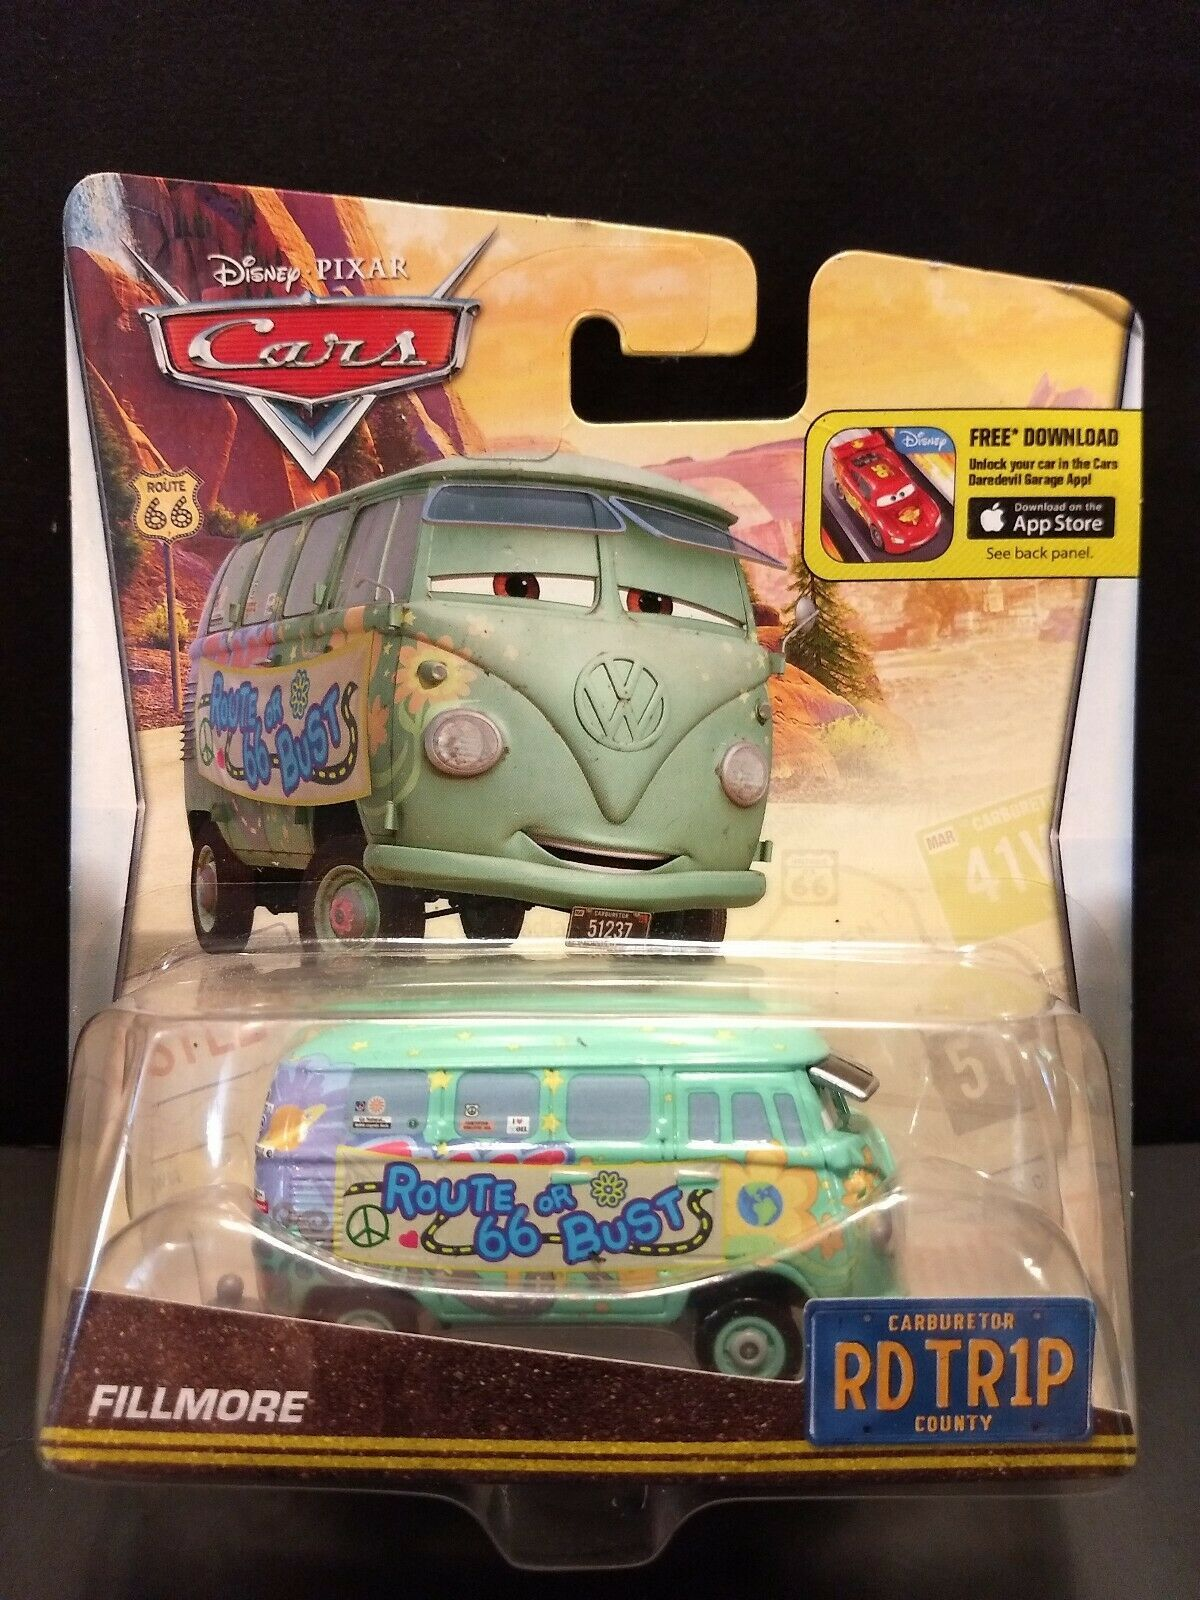 Sealed 2015 Mattel Pixar Disney Cars Fillmore Road Trip toy van Route 66 or Bust